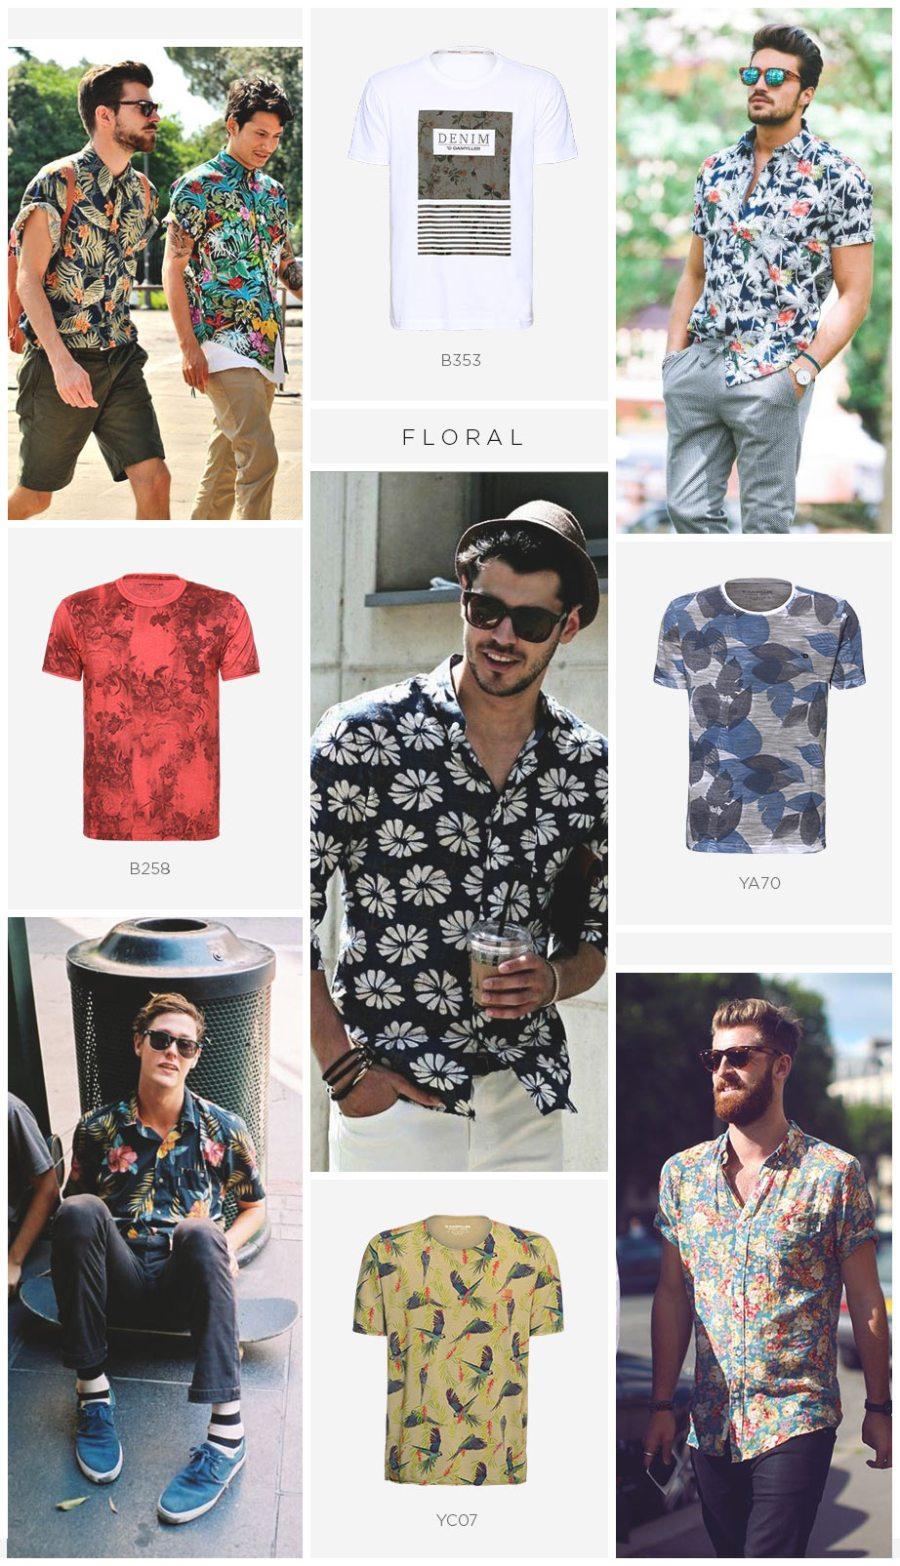 camiseta floral masculina street style